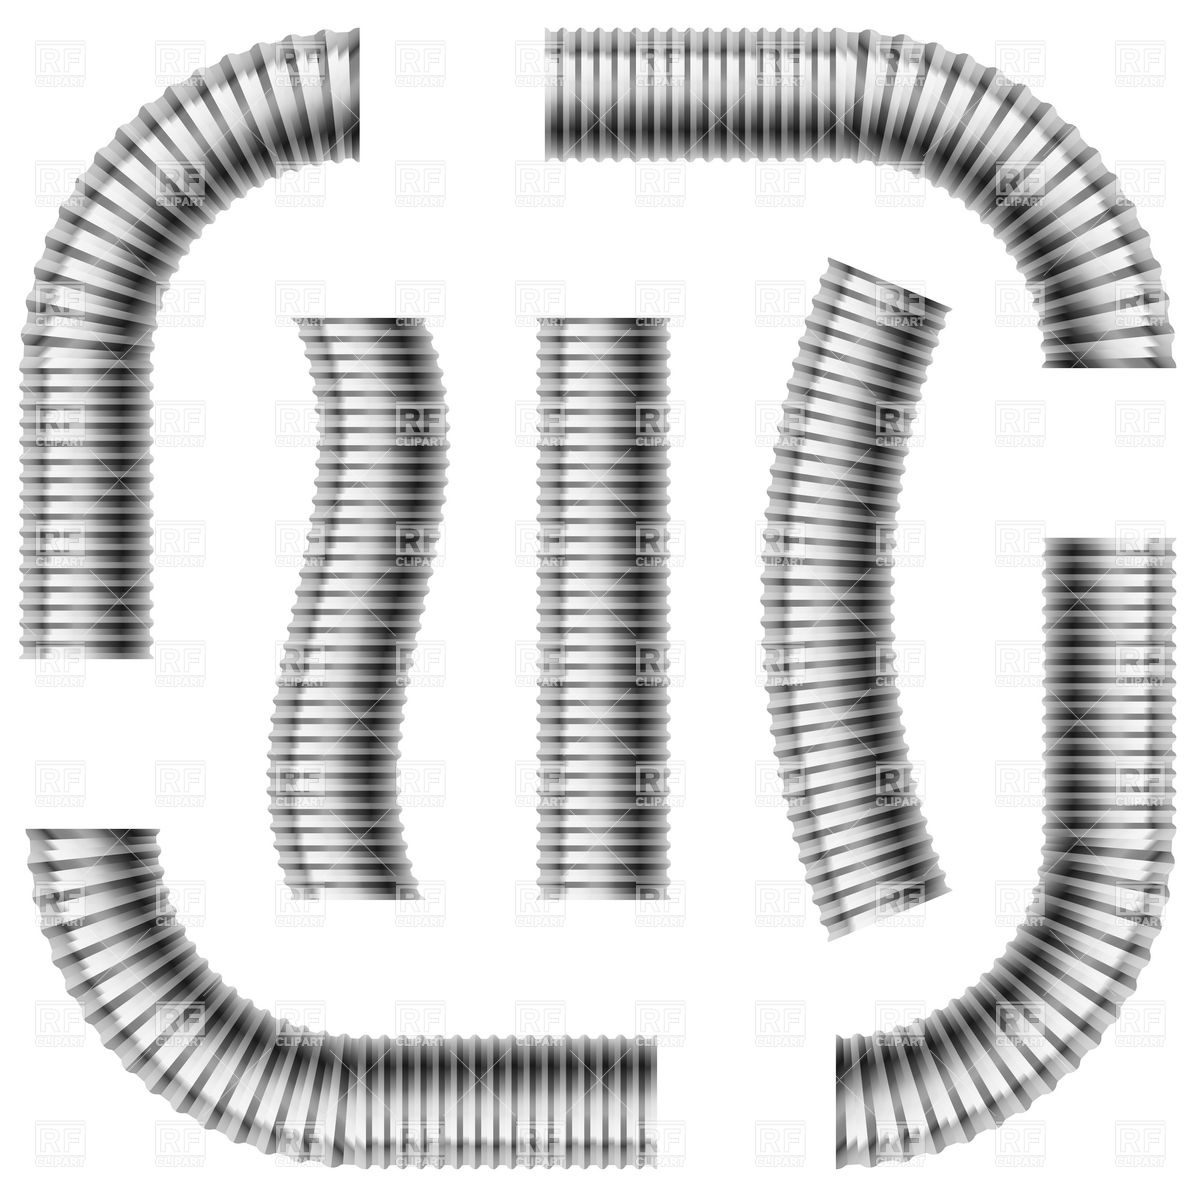 1200x1200 Set Of Gray Corrugated Drain Pipes Vector Image Vector Artwork